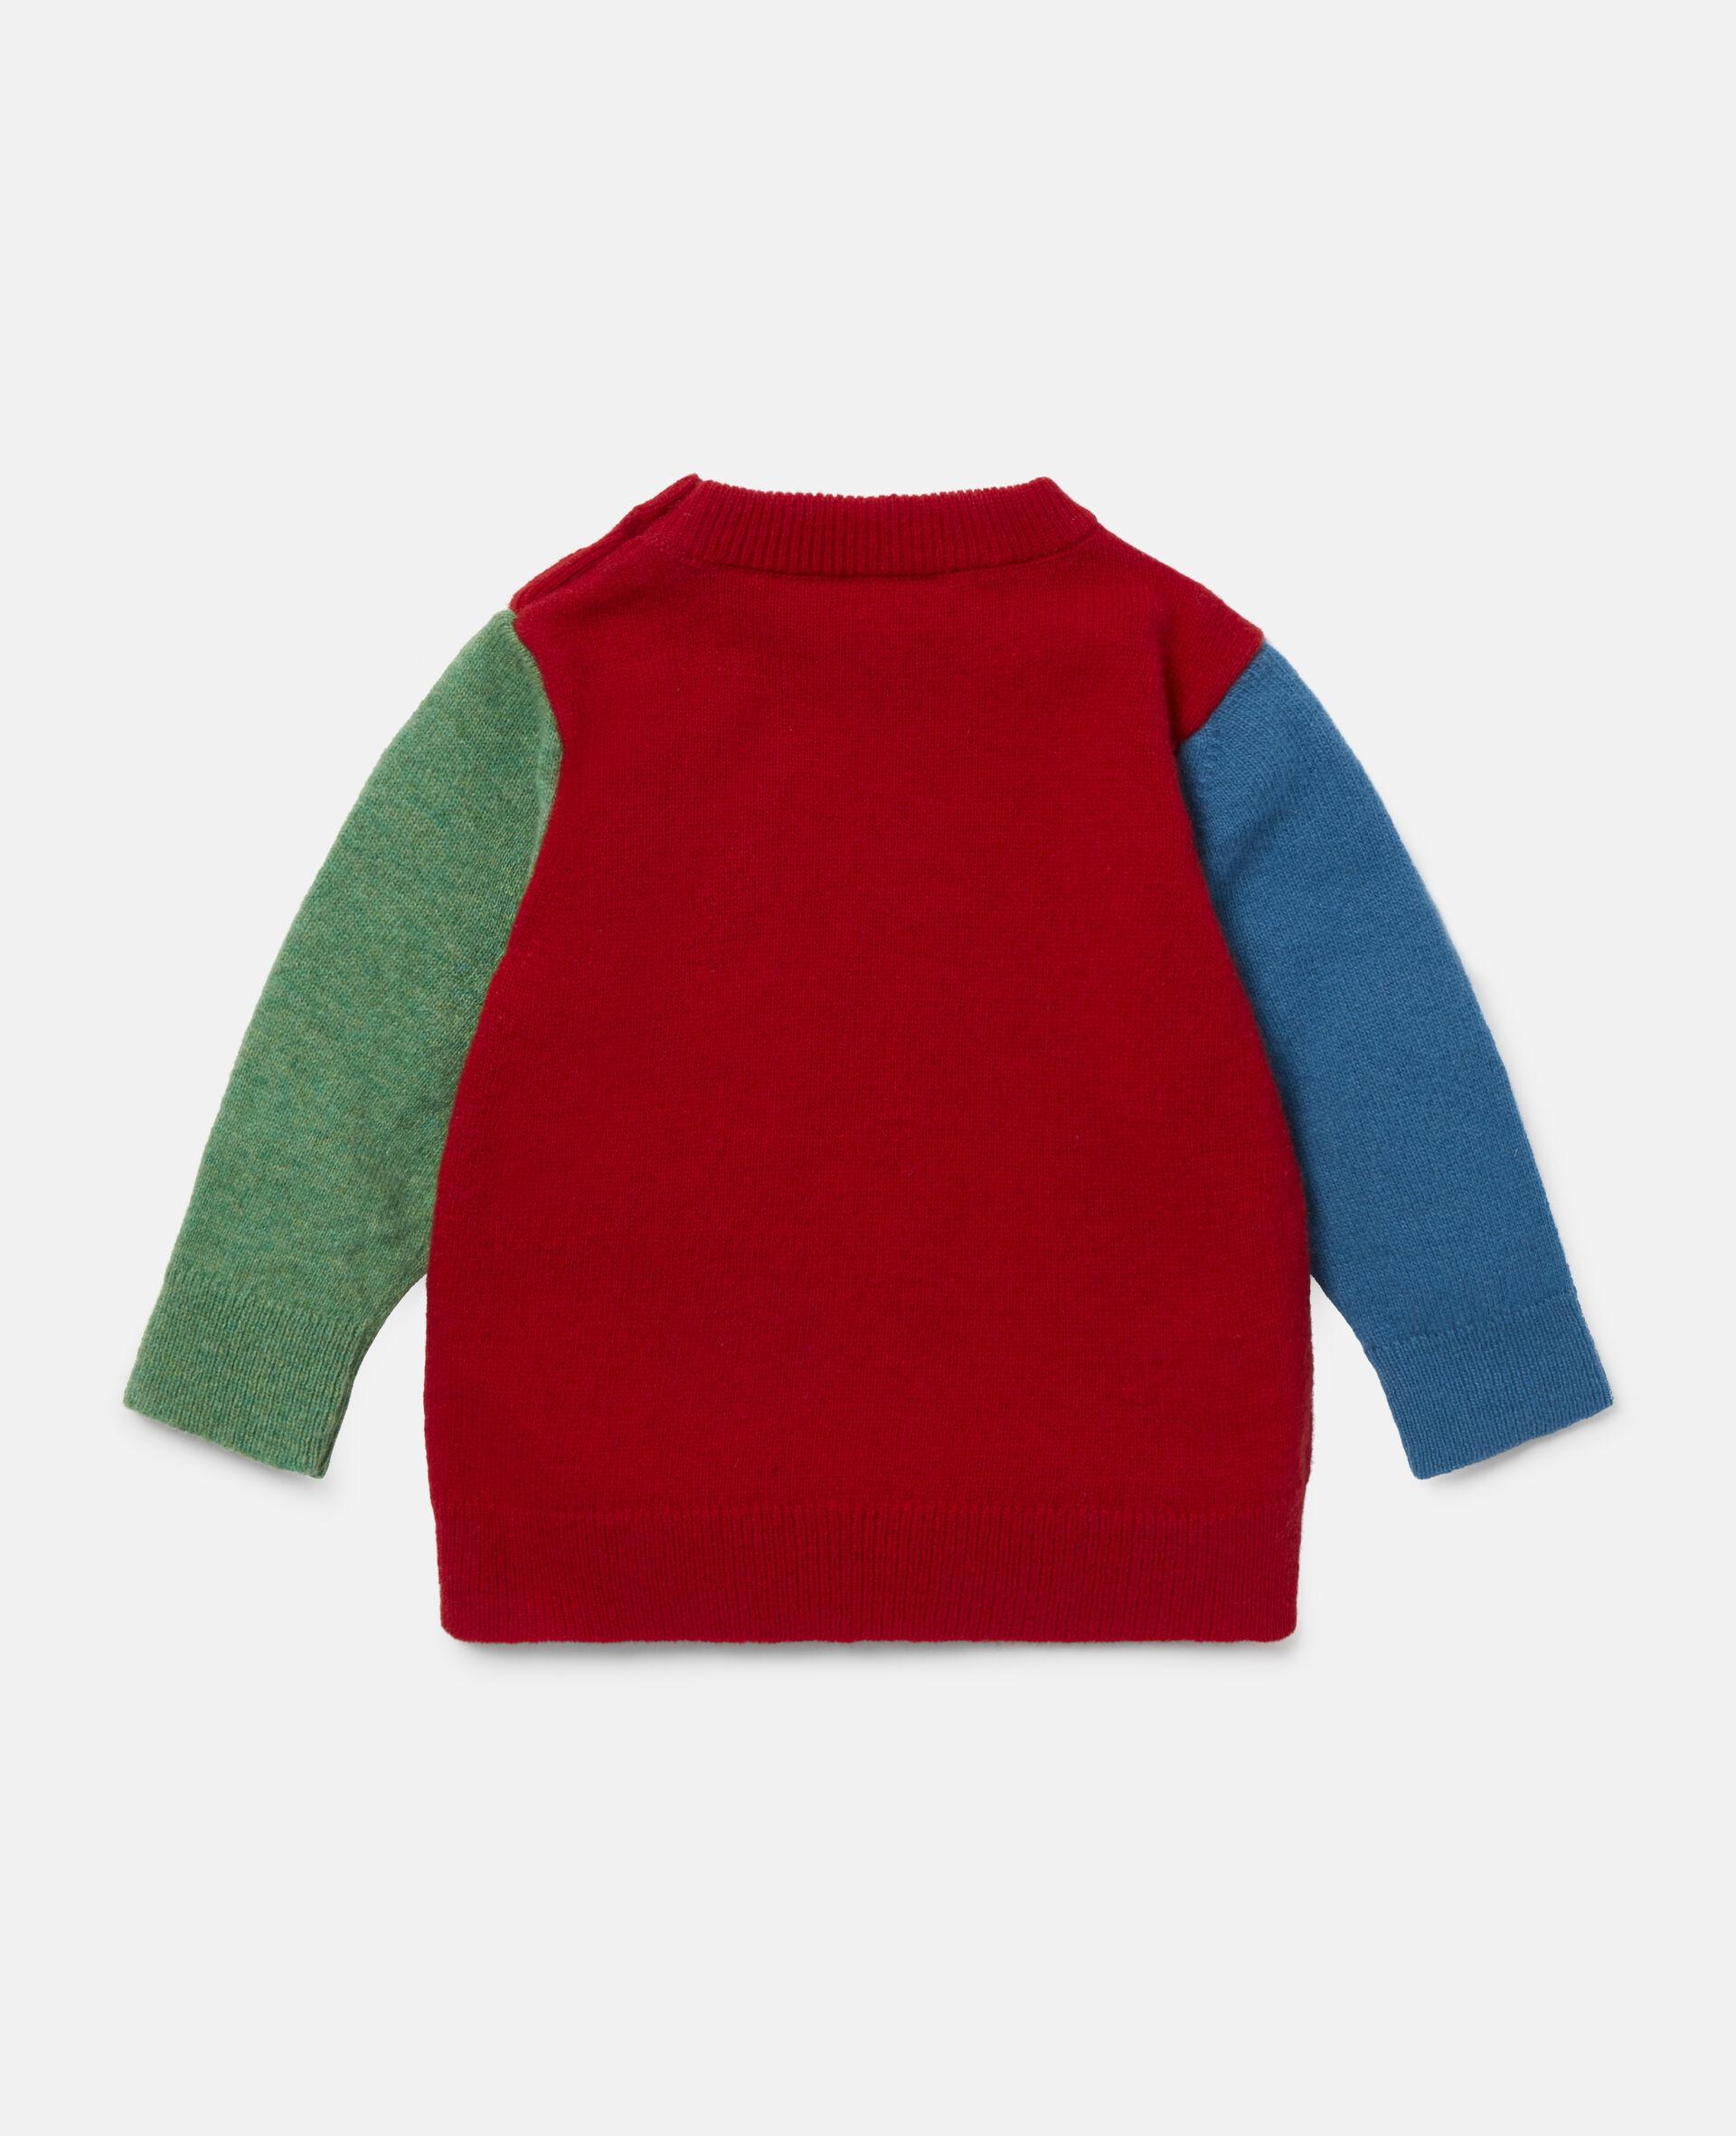 Colourblock Knit Intarsia Jumper-Multicolour-large image number 3